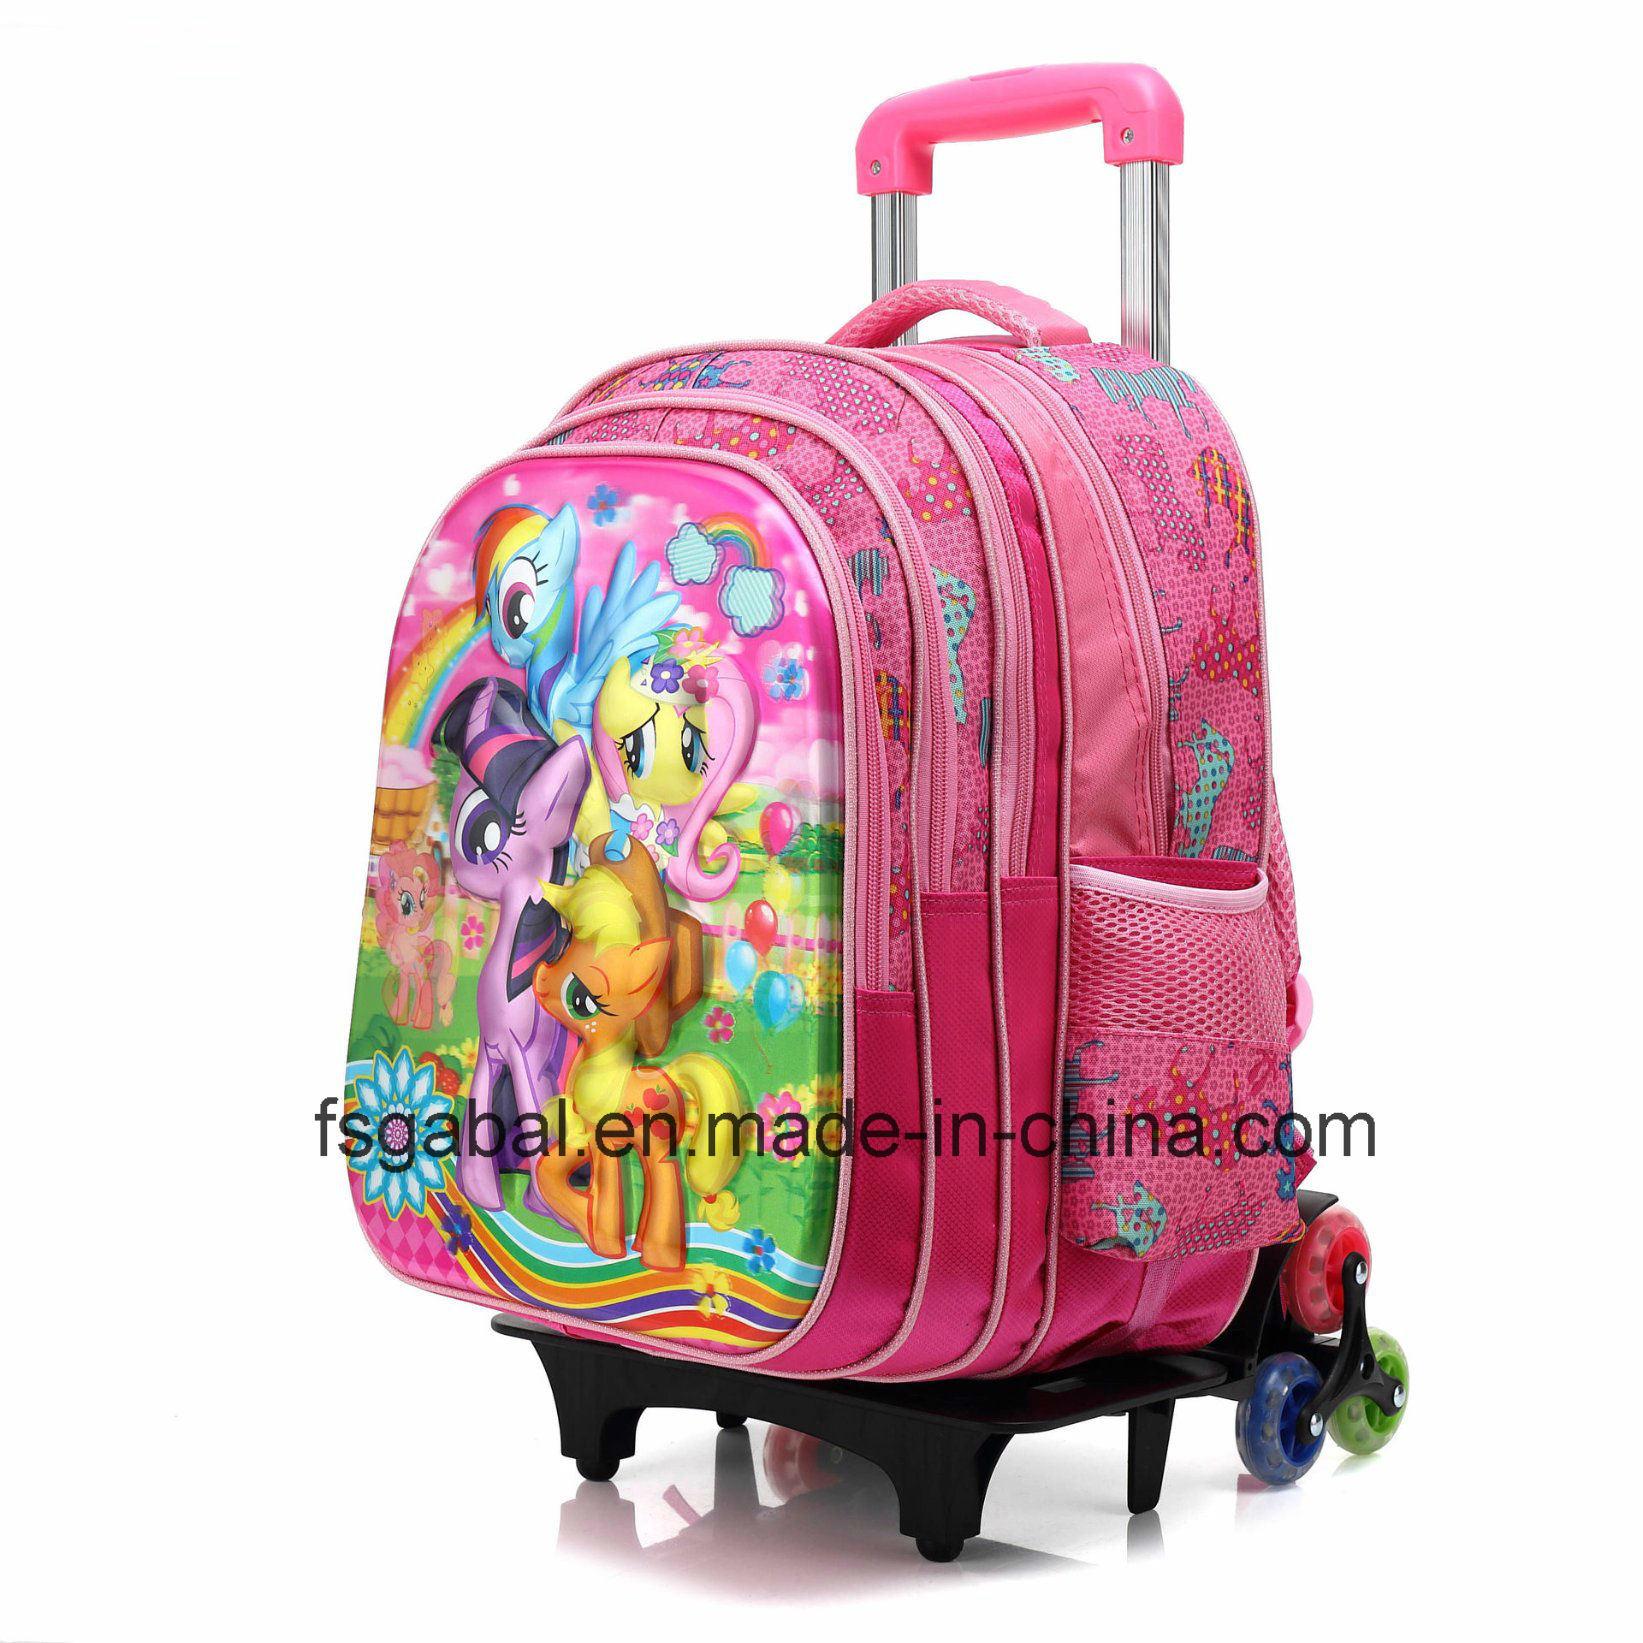 Wholesale School Backpacks Manufacturers- Fenix Toulouse Handball 78a91bdc95b4c